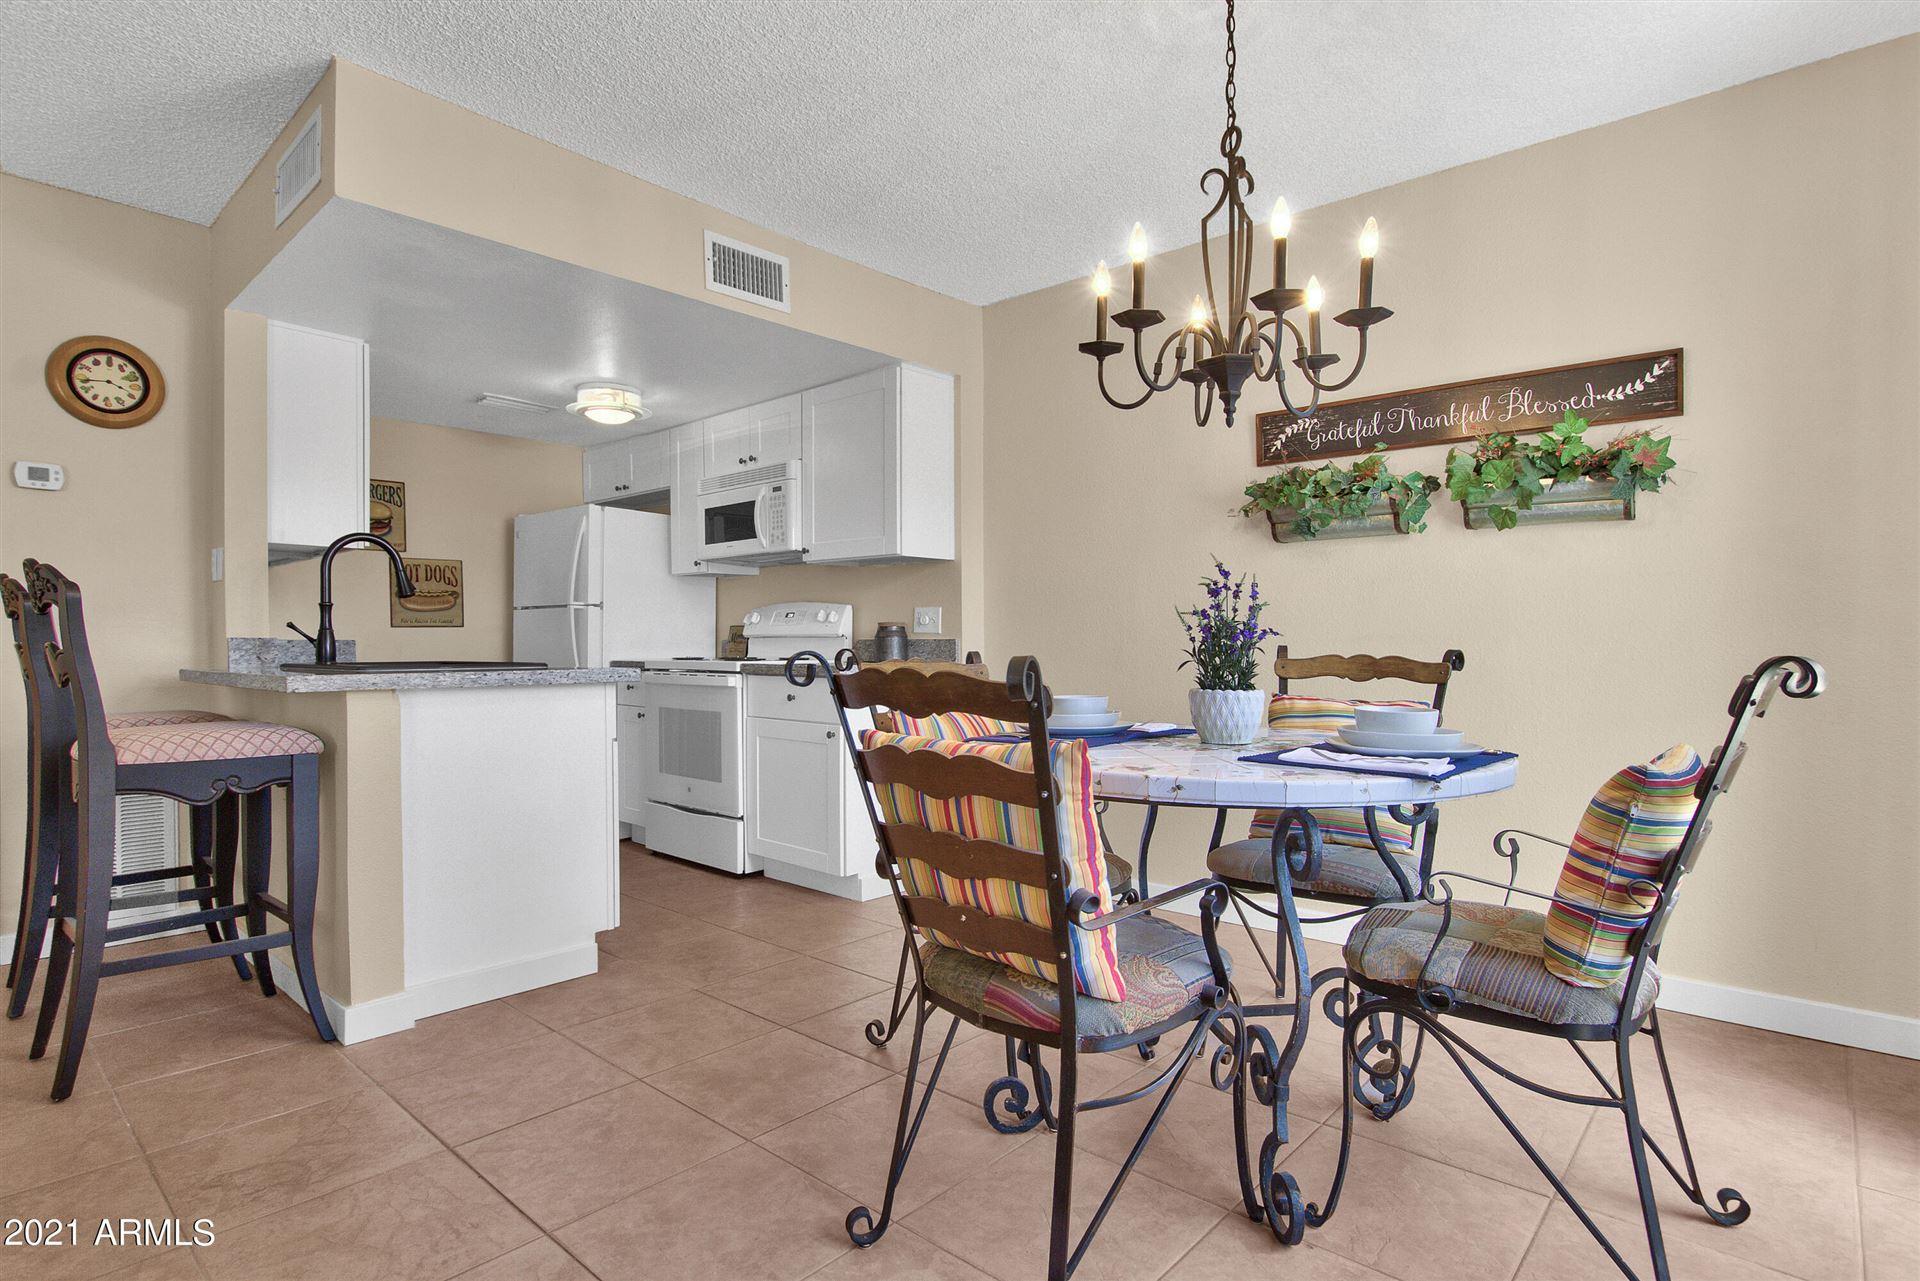 Photo of 14419 N Boxwood Lane, Fountain Hills, AZ 85268 (MLS # 6201326)